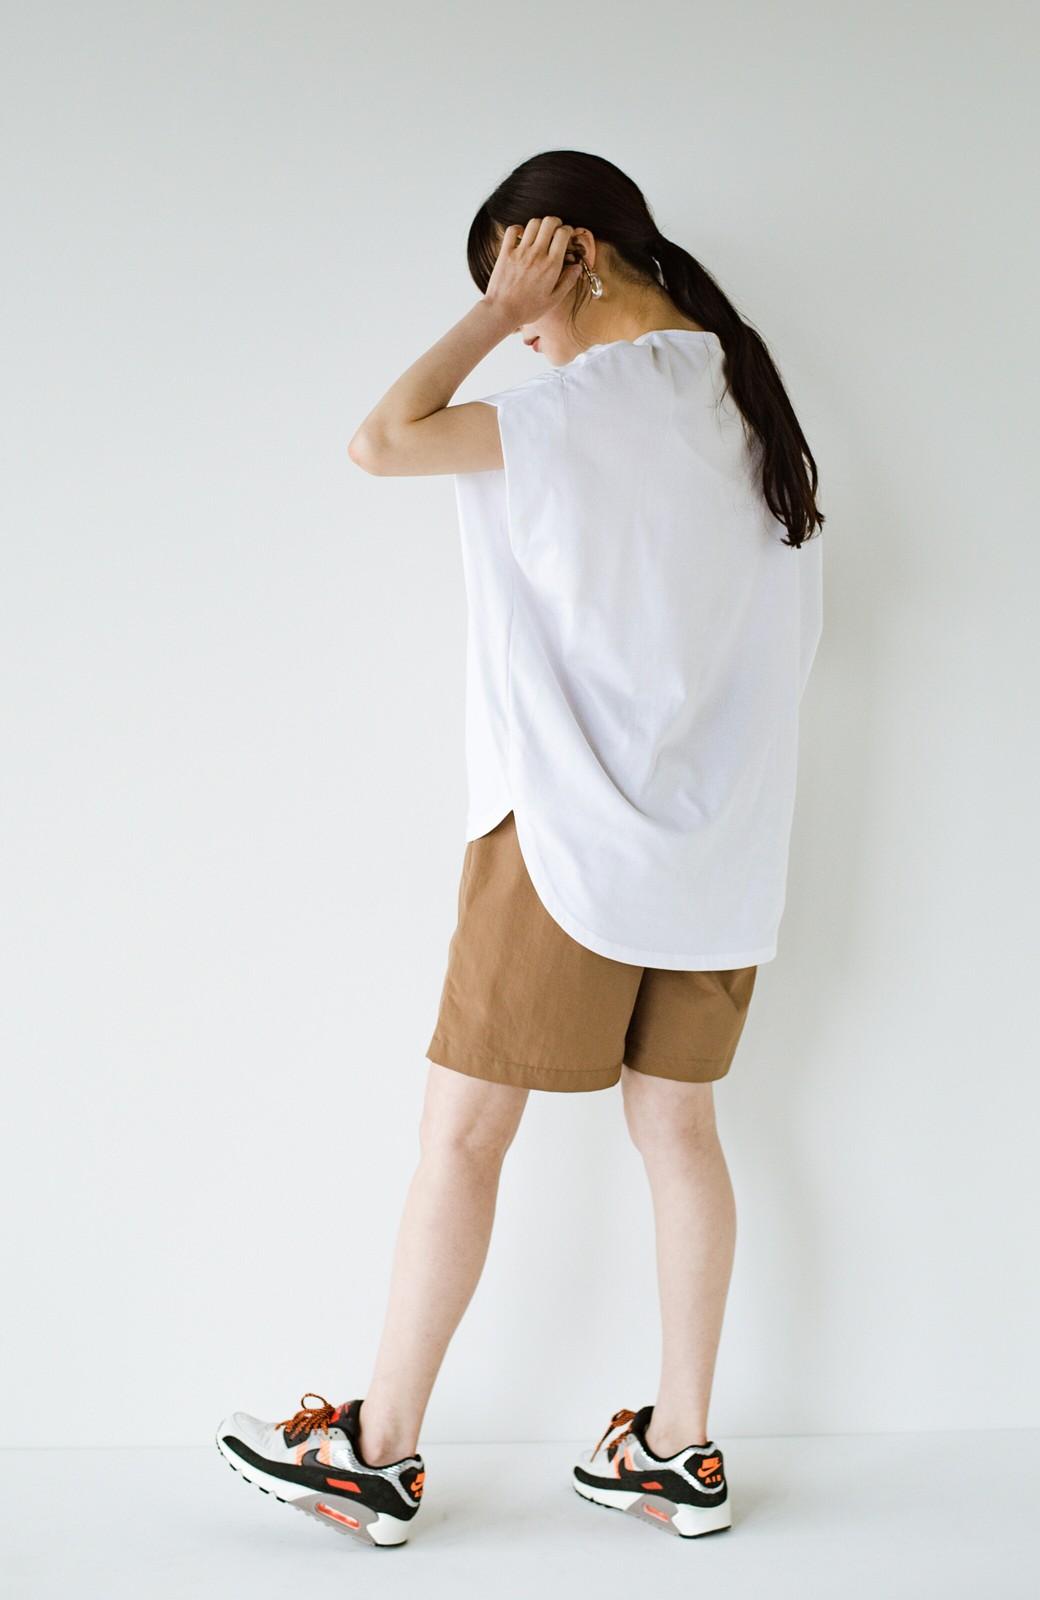 haco! PBPオーガニックコットン 楽ちんなのにブラウス気分で着られる大人のおめかしTシャツ <ホワイト>の商品写真21